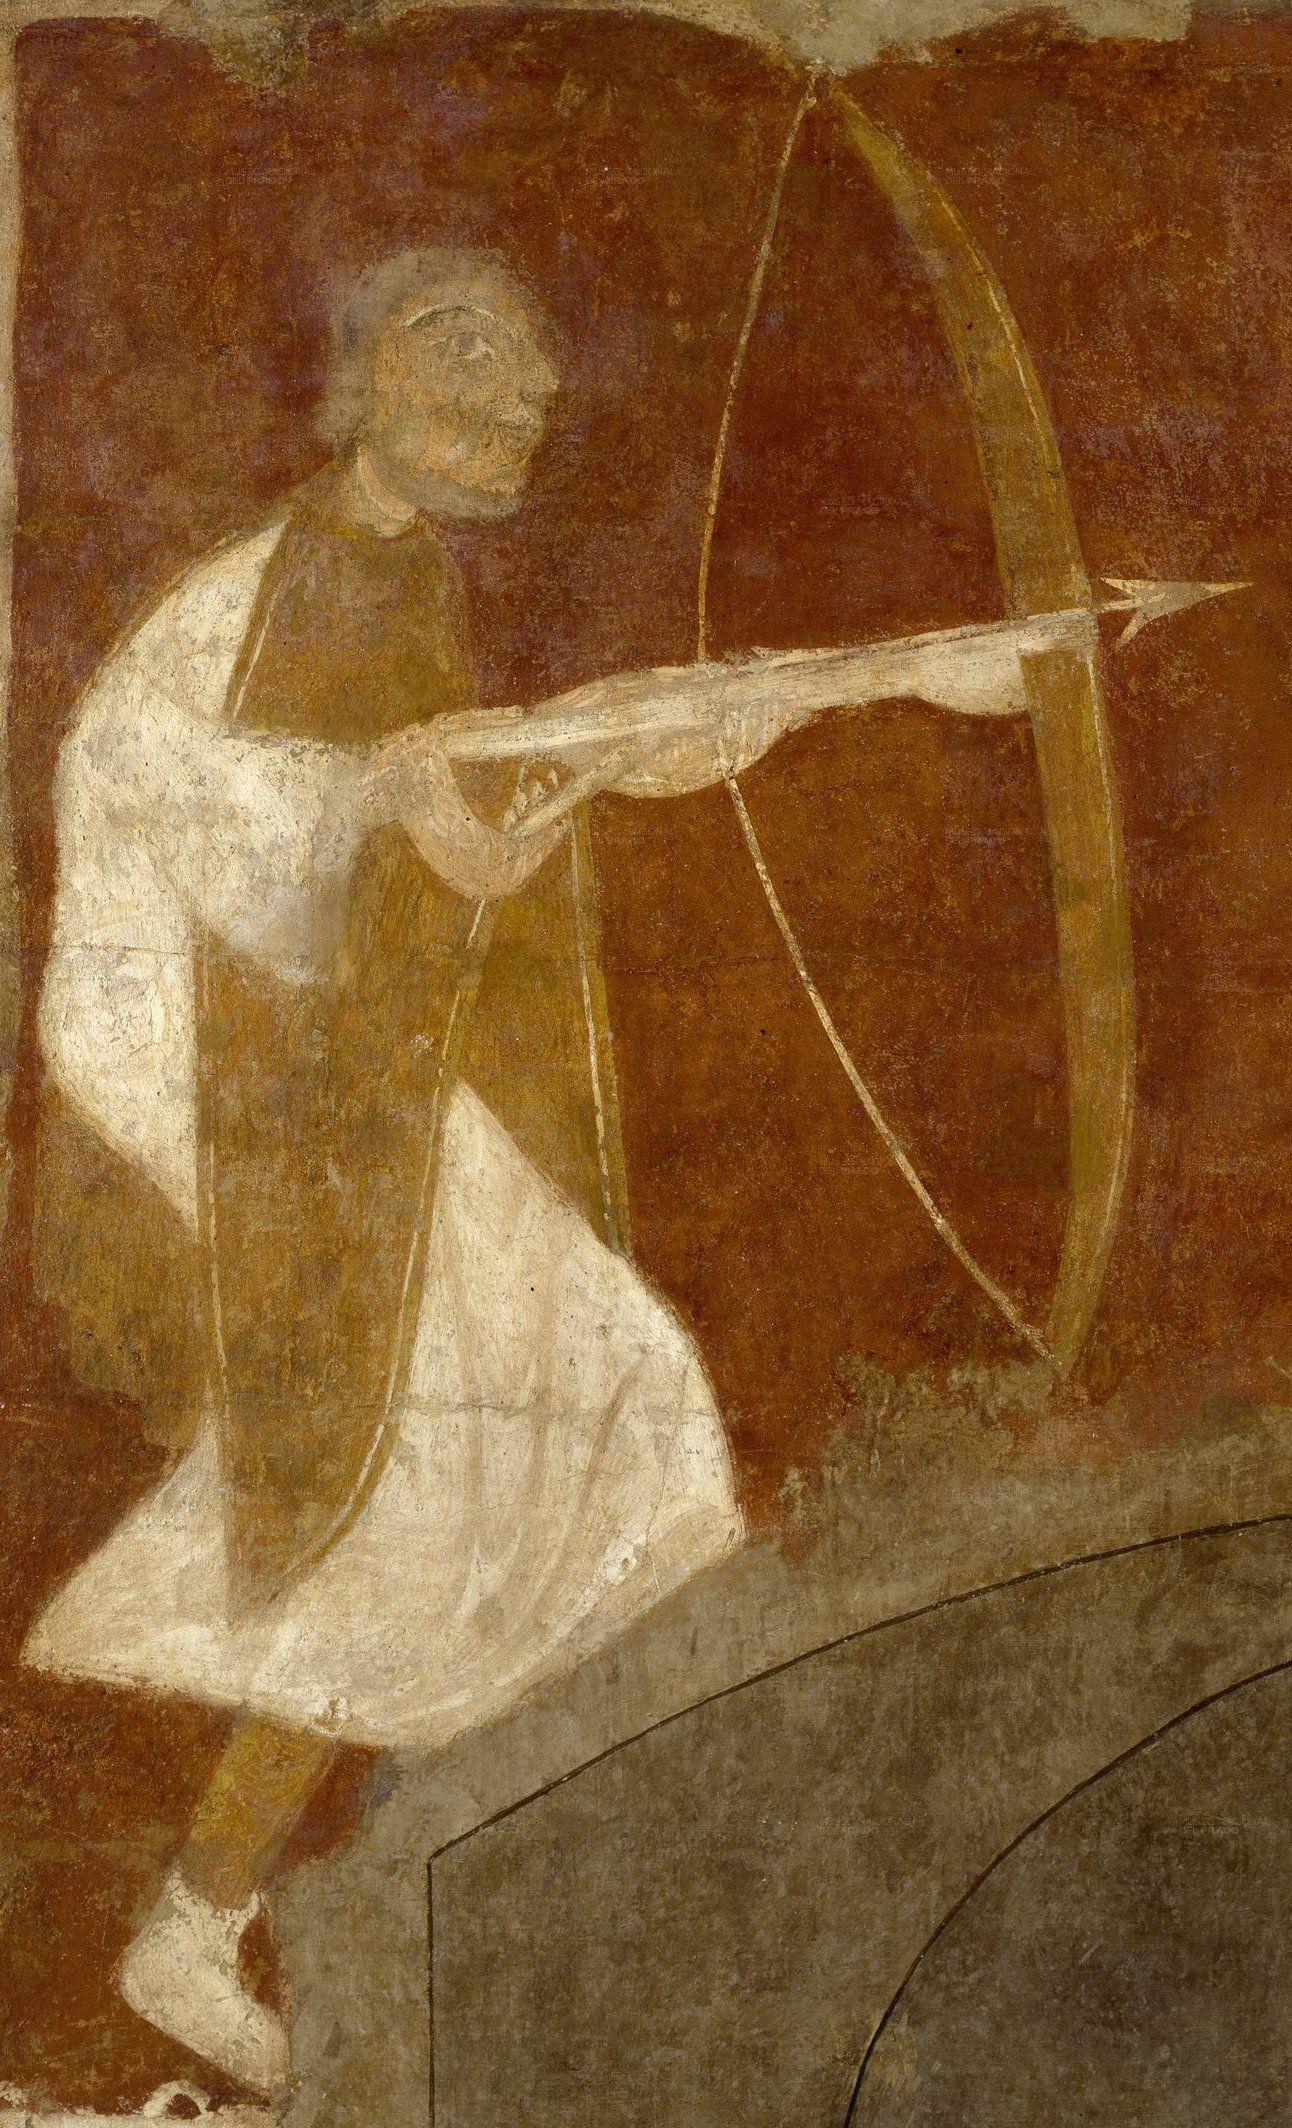 Fresco from the Church of San Baudelio de Berlanga, Soria, Spain - 12th century Archer hunting with Crossbow